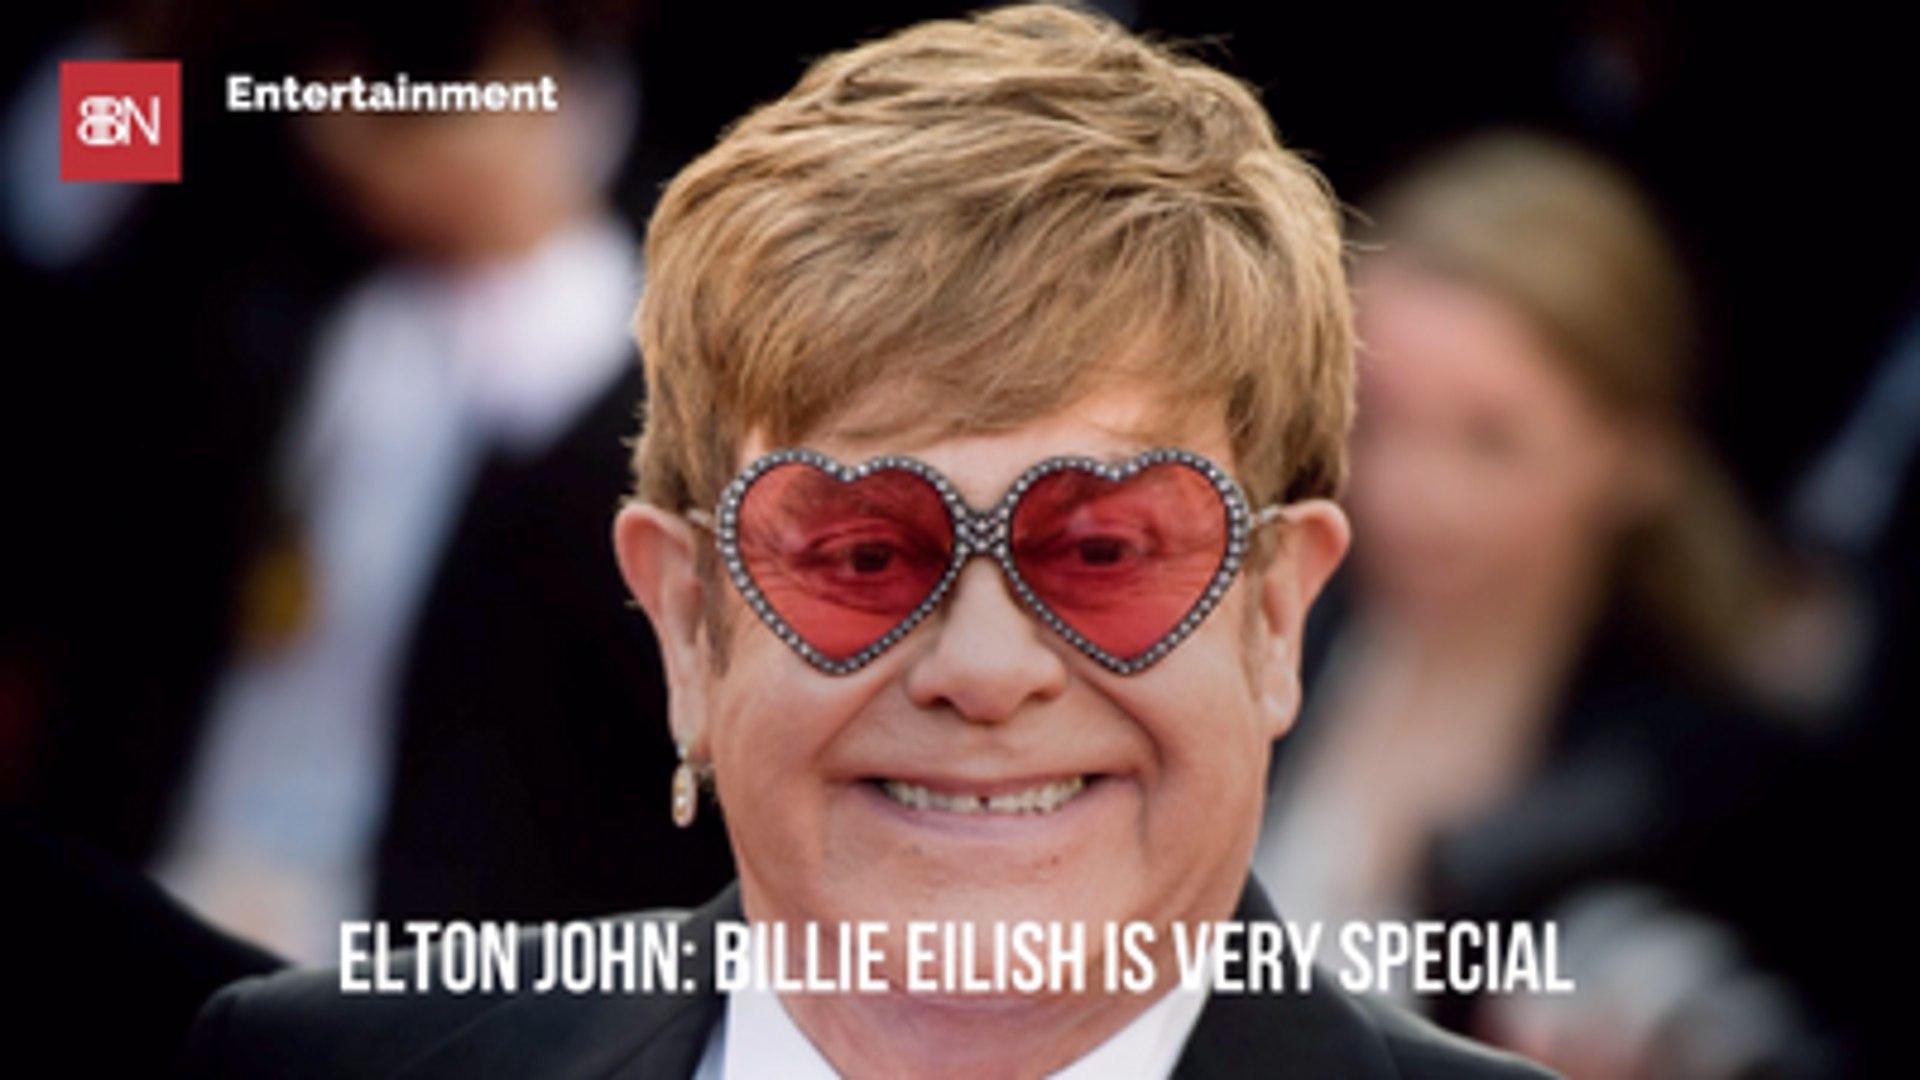 Elton John Sees Something Special In Billie Eilish